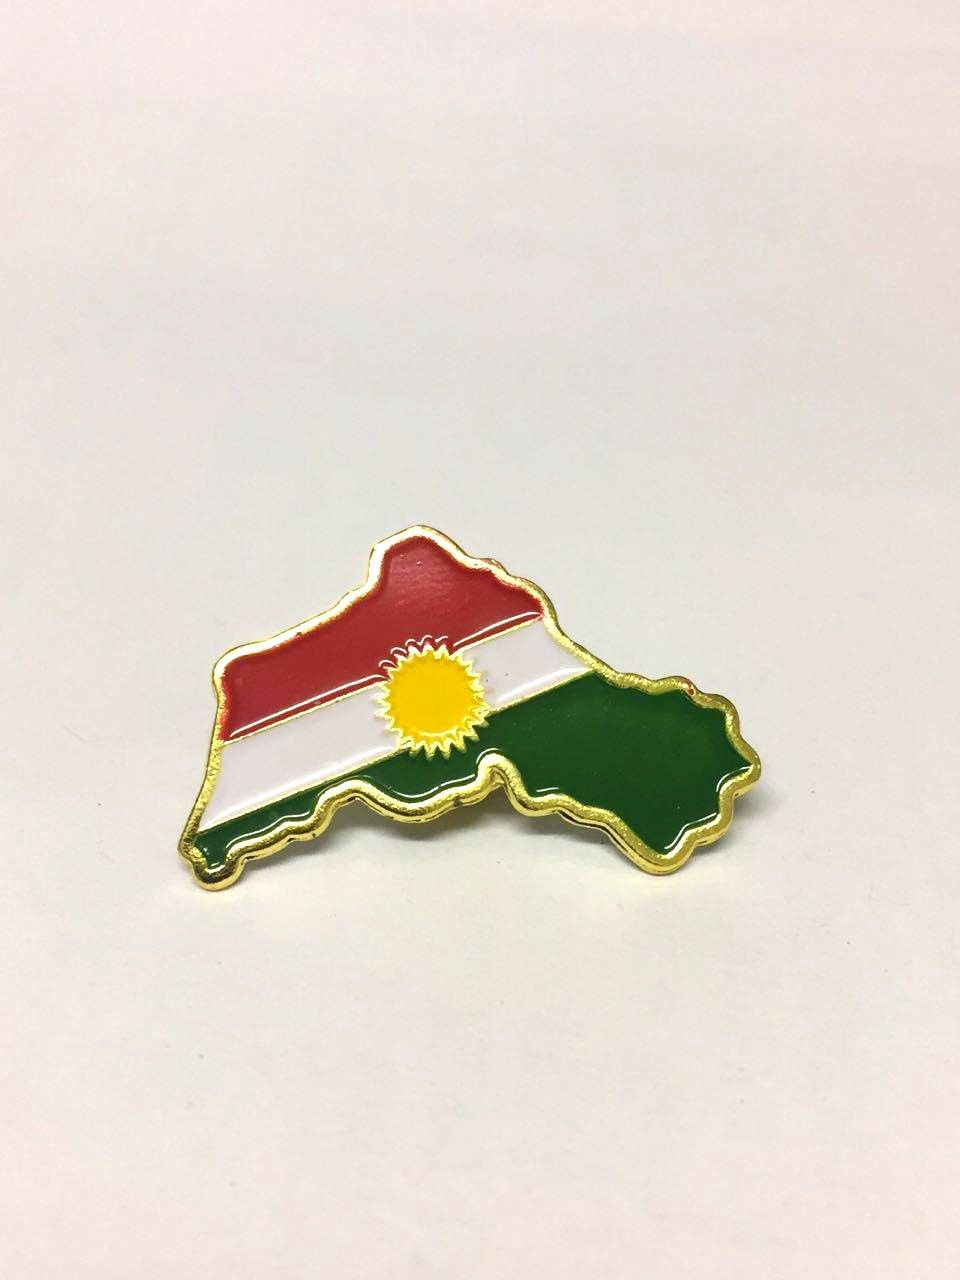 Metal Brooch New Brunswick Flag Lapel Pins Badges On A Pin Brooch Jewelry Rozetten Papier 300pcs Ks0224 Buy Now Home & Garden